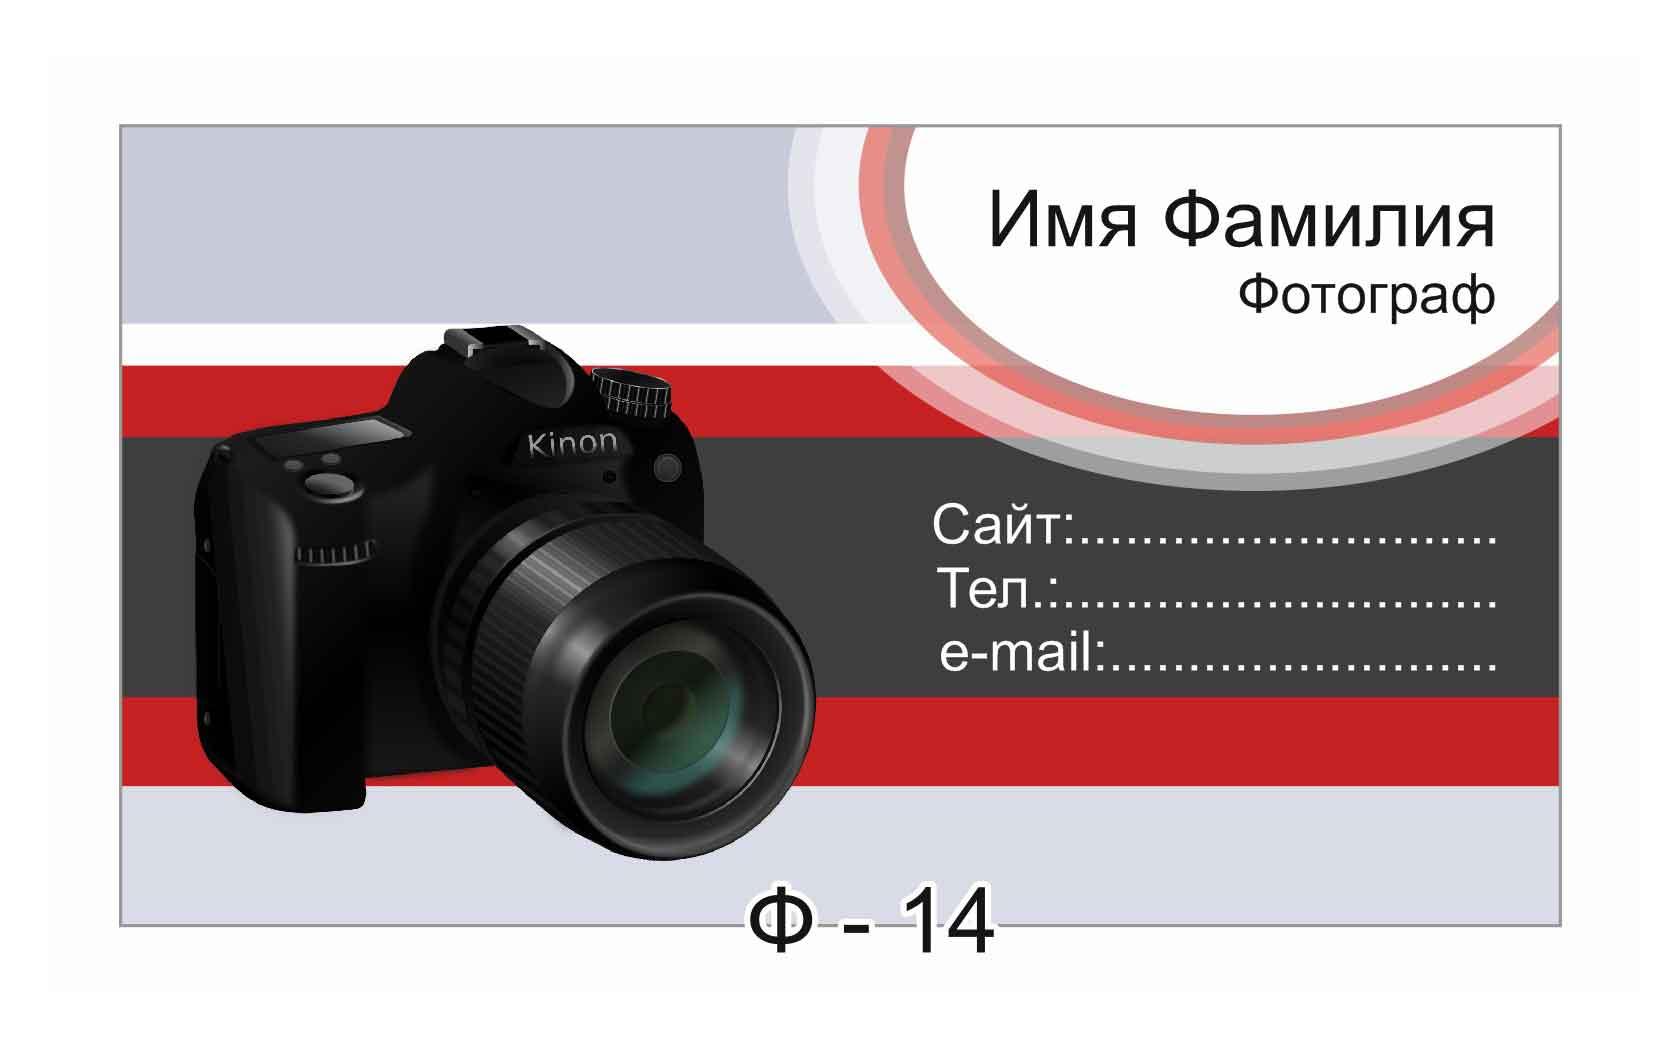 Шаблоны визиток массажиста для фотошопа скачать бесплатно: http://svbox.info/blogs/omesgram/shablony-vizitok-massazhista-dlja-fotoshopa-skachat-besplatno.html